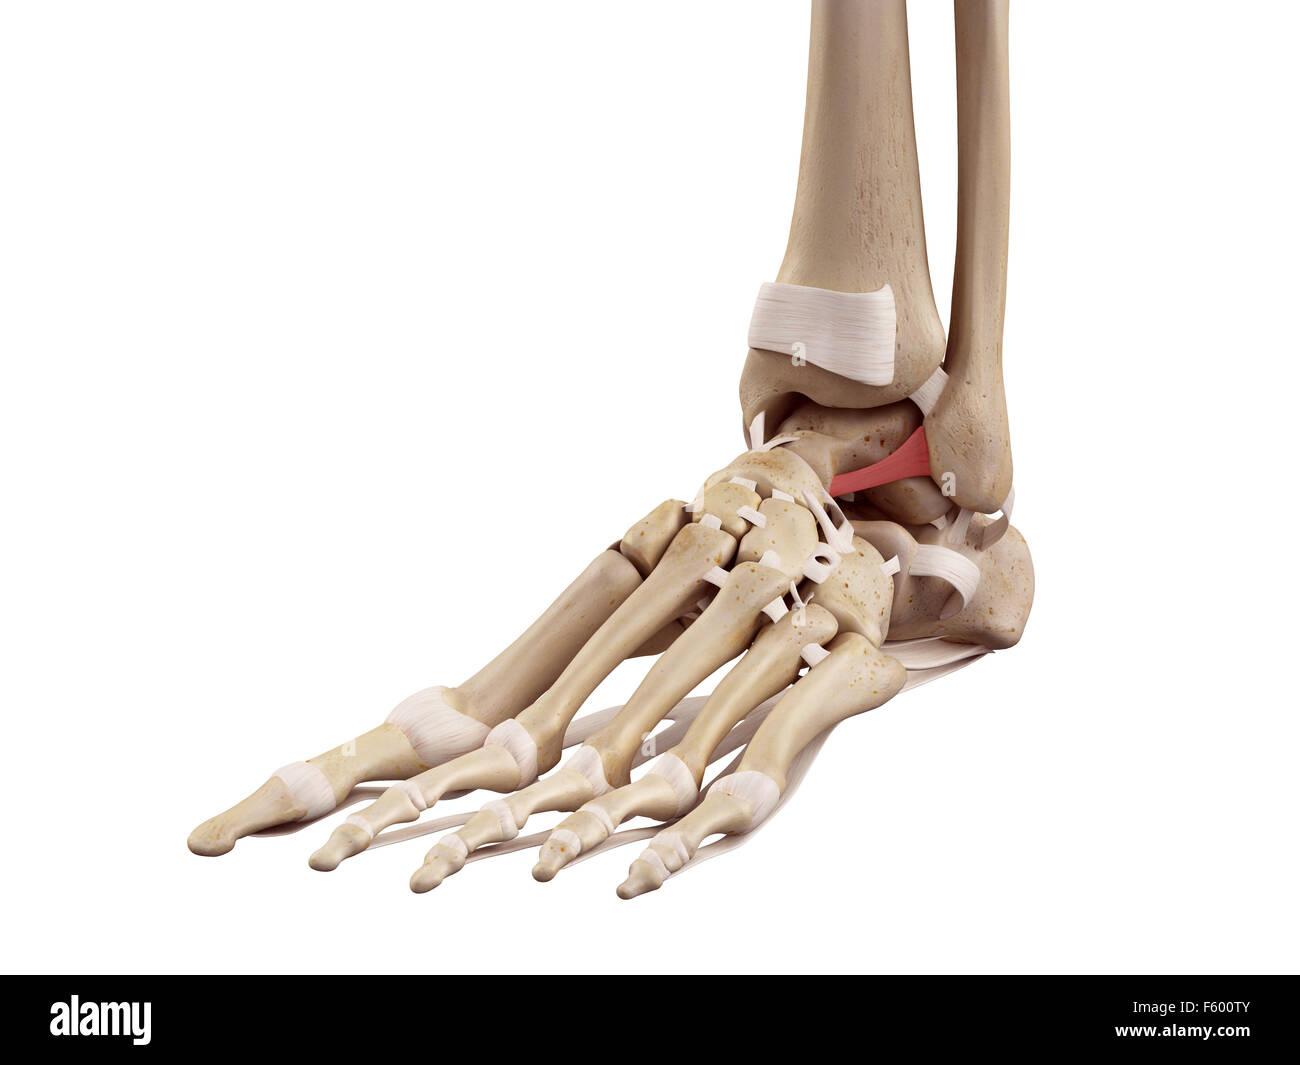 medical accurate illustration of the anterior talofibular ligament - Stock Image